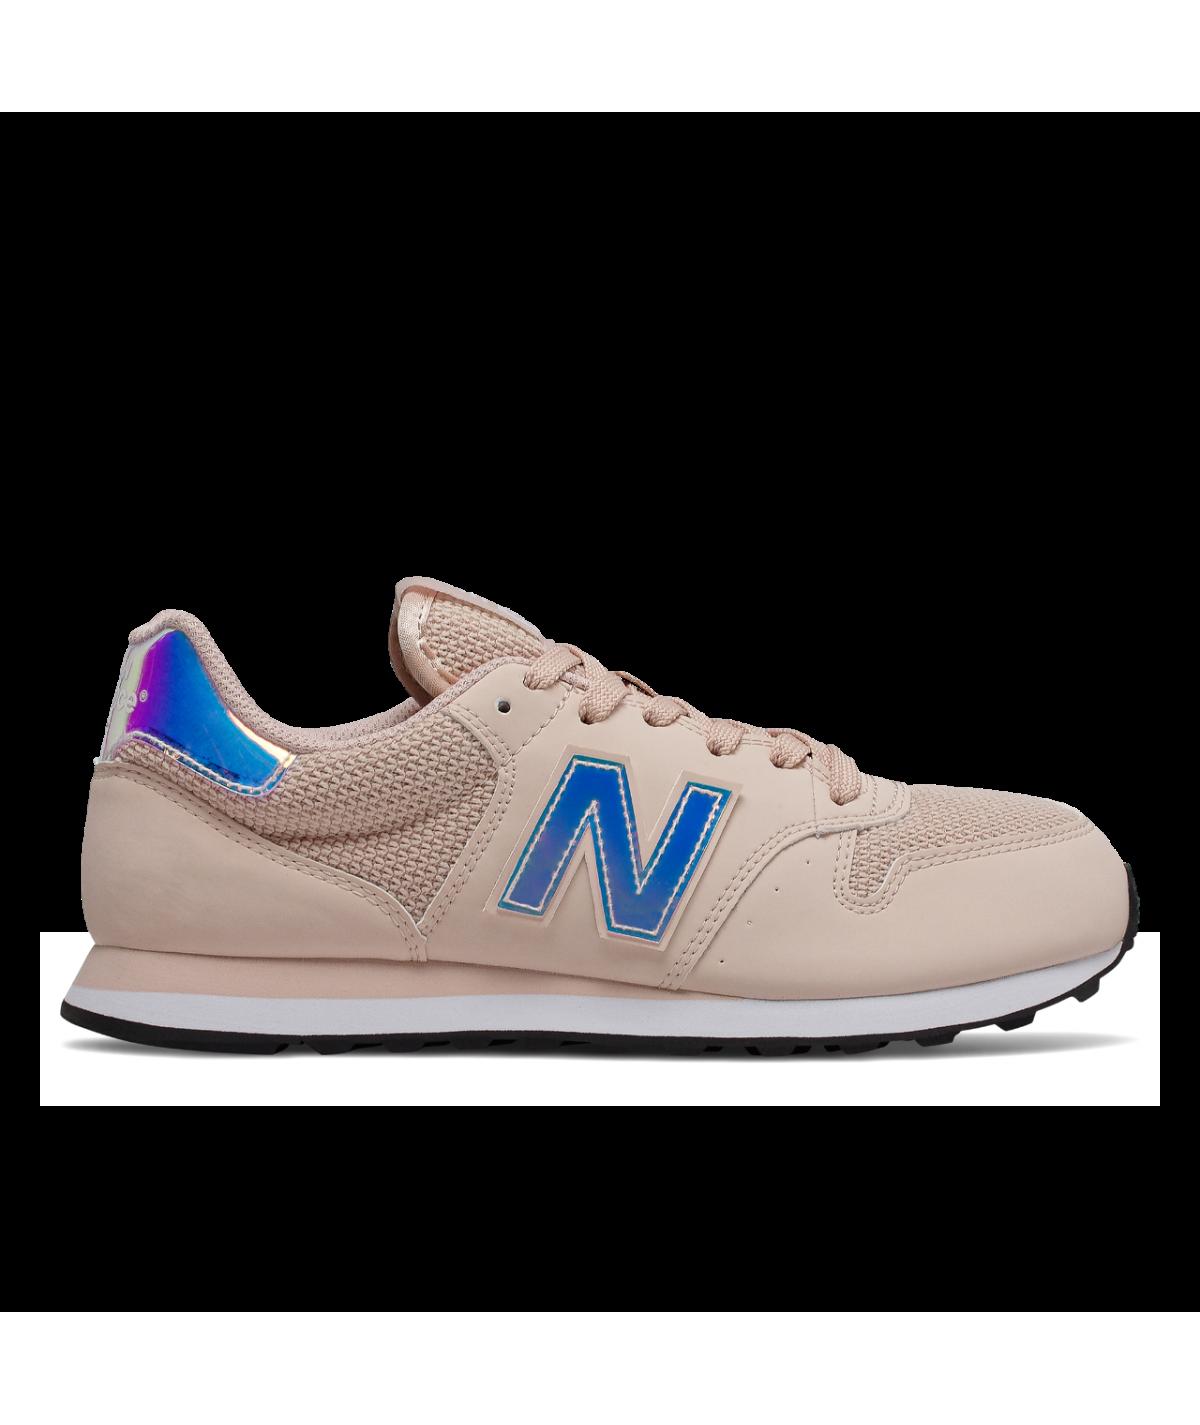 Buy New Balance 997 HJB Sneaker damen schwarz